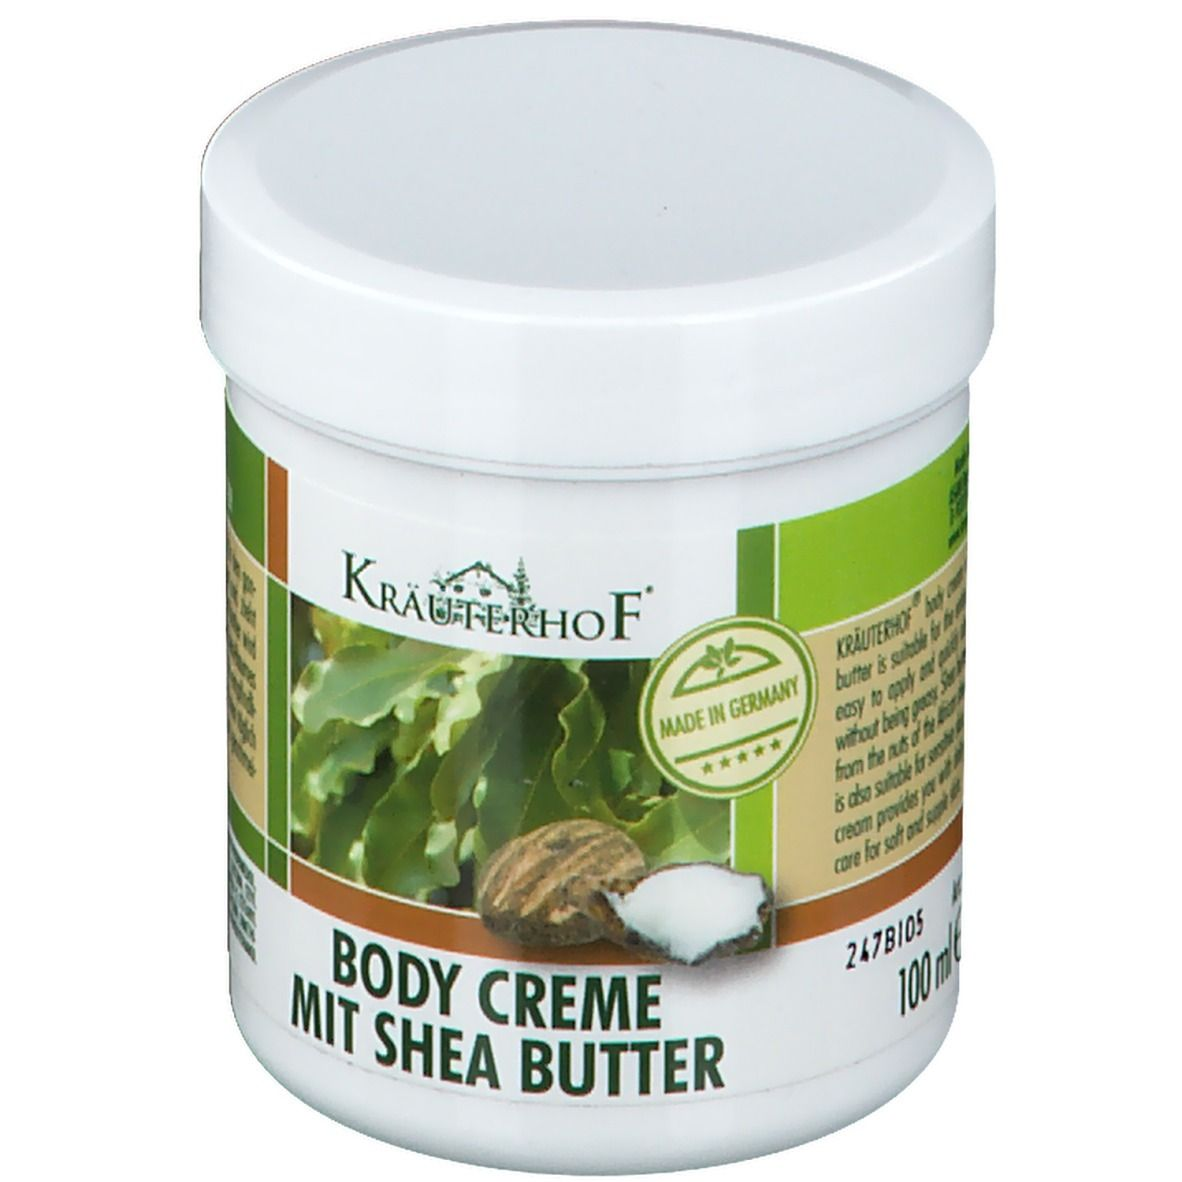 Kräuterhof® Body Creme mit Sheabutter